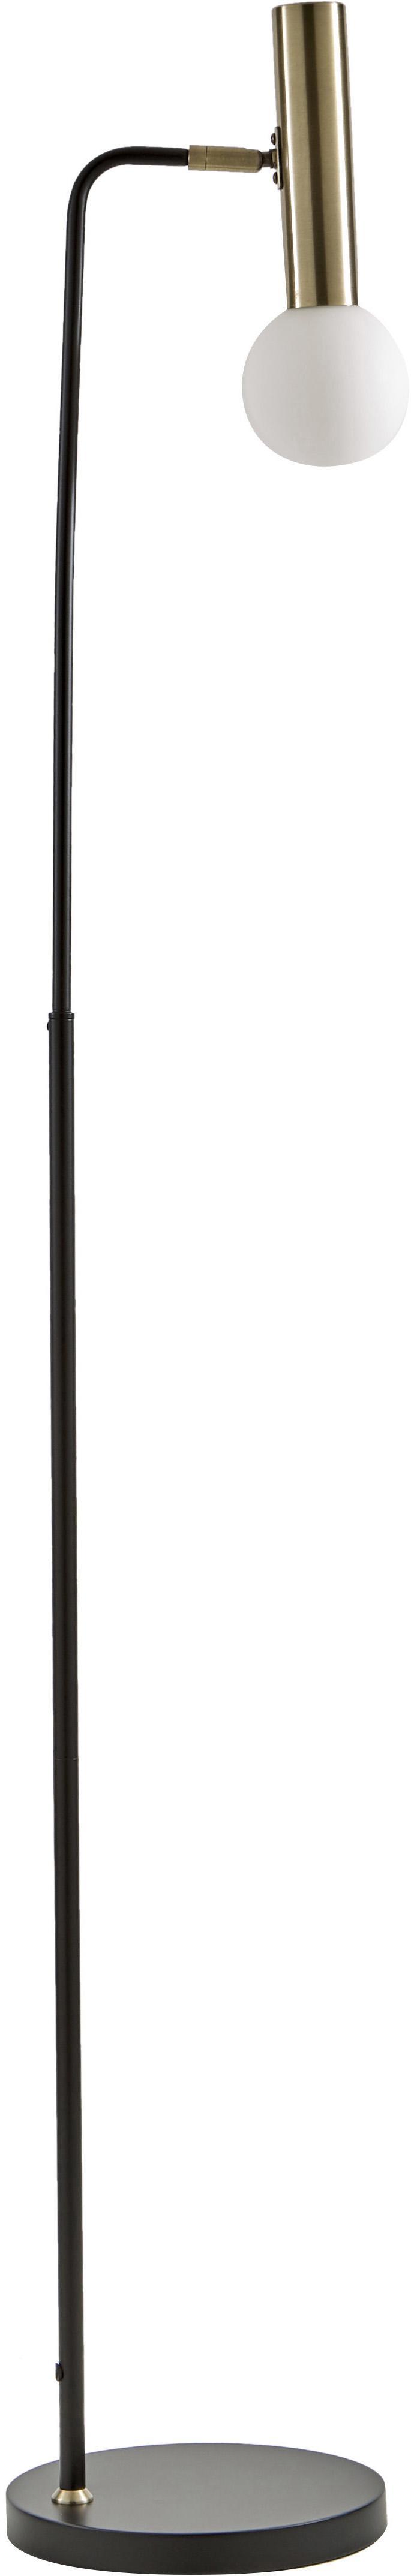 Lampada da terra Wilson, Base della lampada: metallo, Paralume: vetro, Nero, Ø 23 x Alt. 153 cm